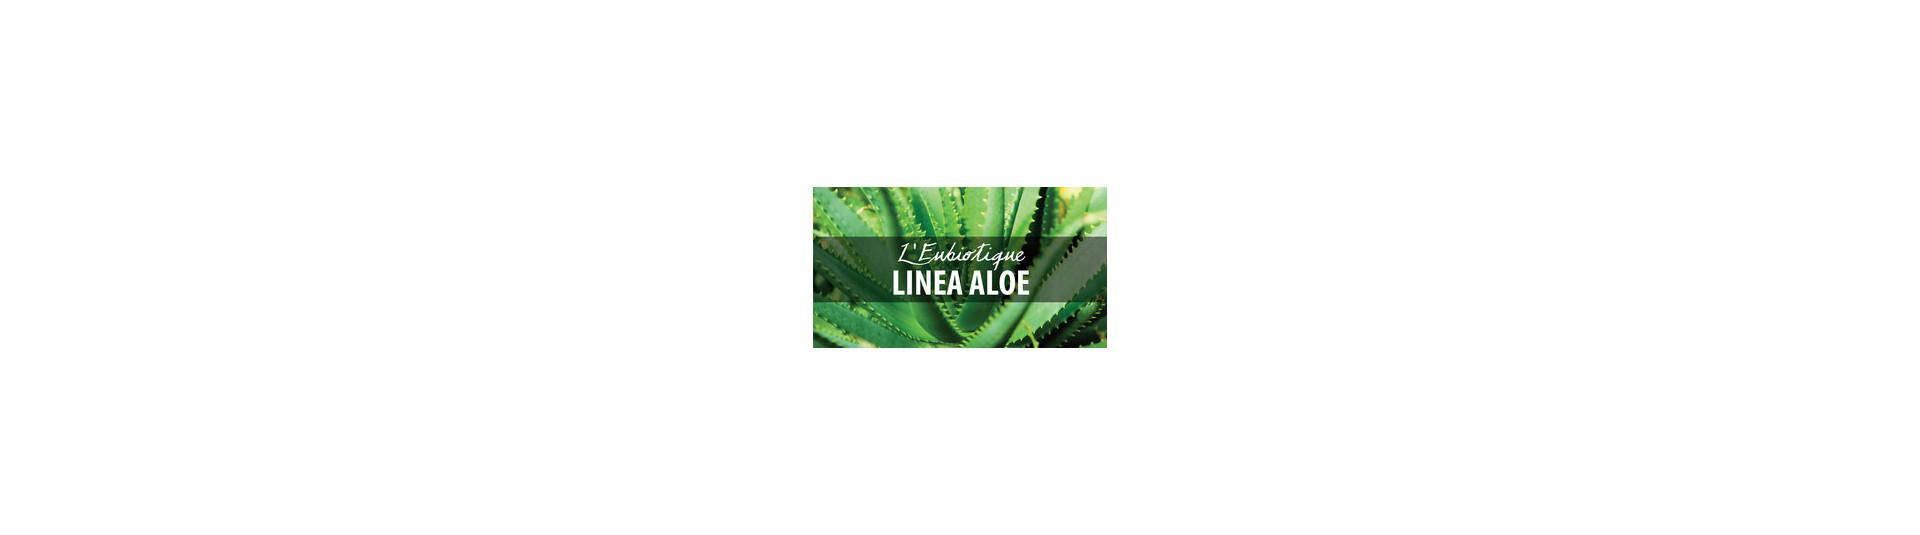 Linea Aloe